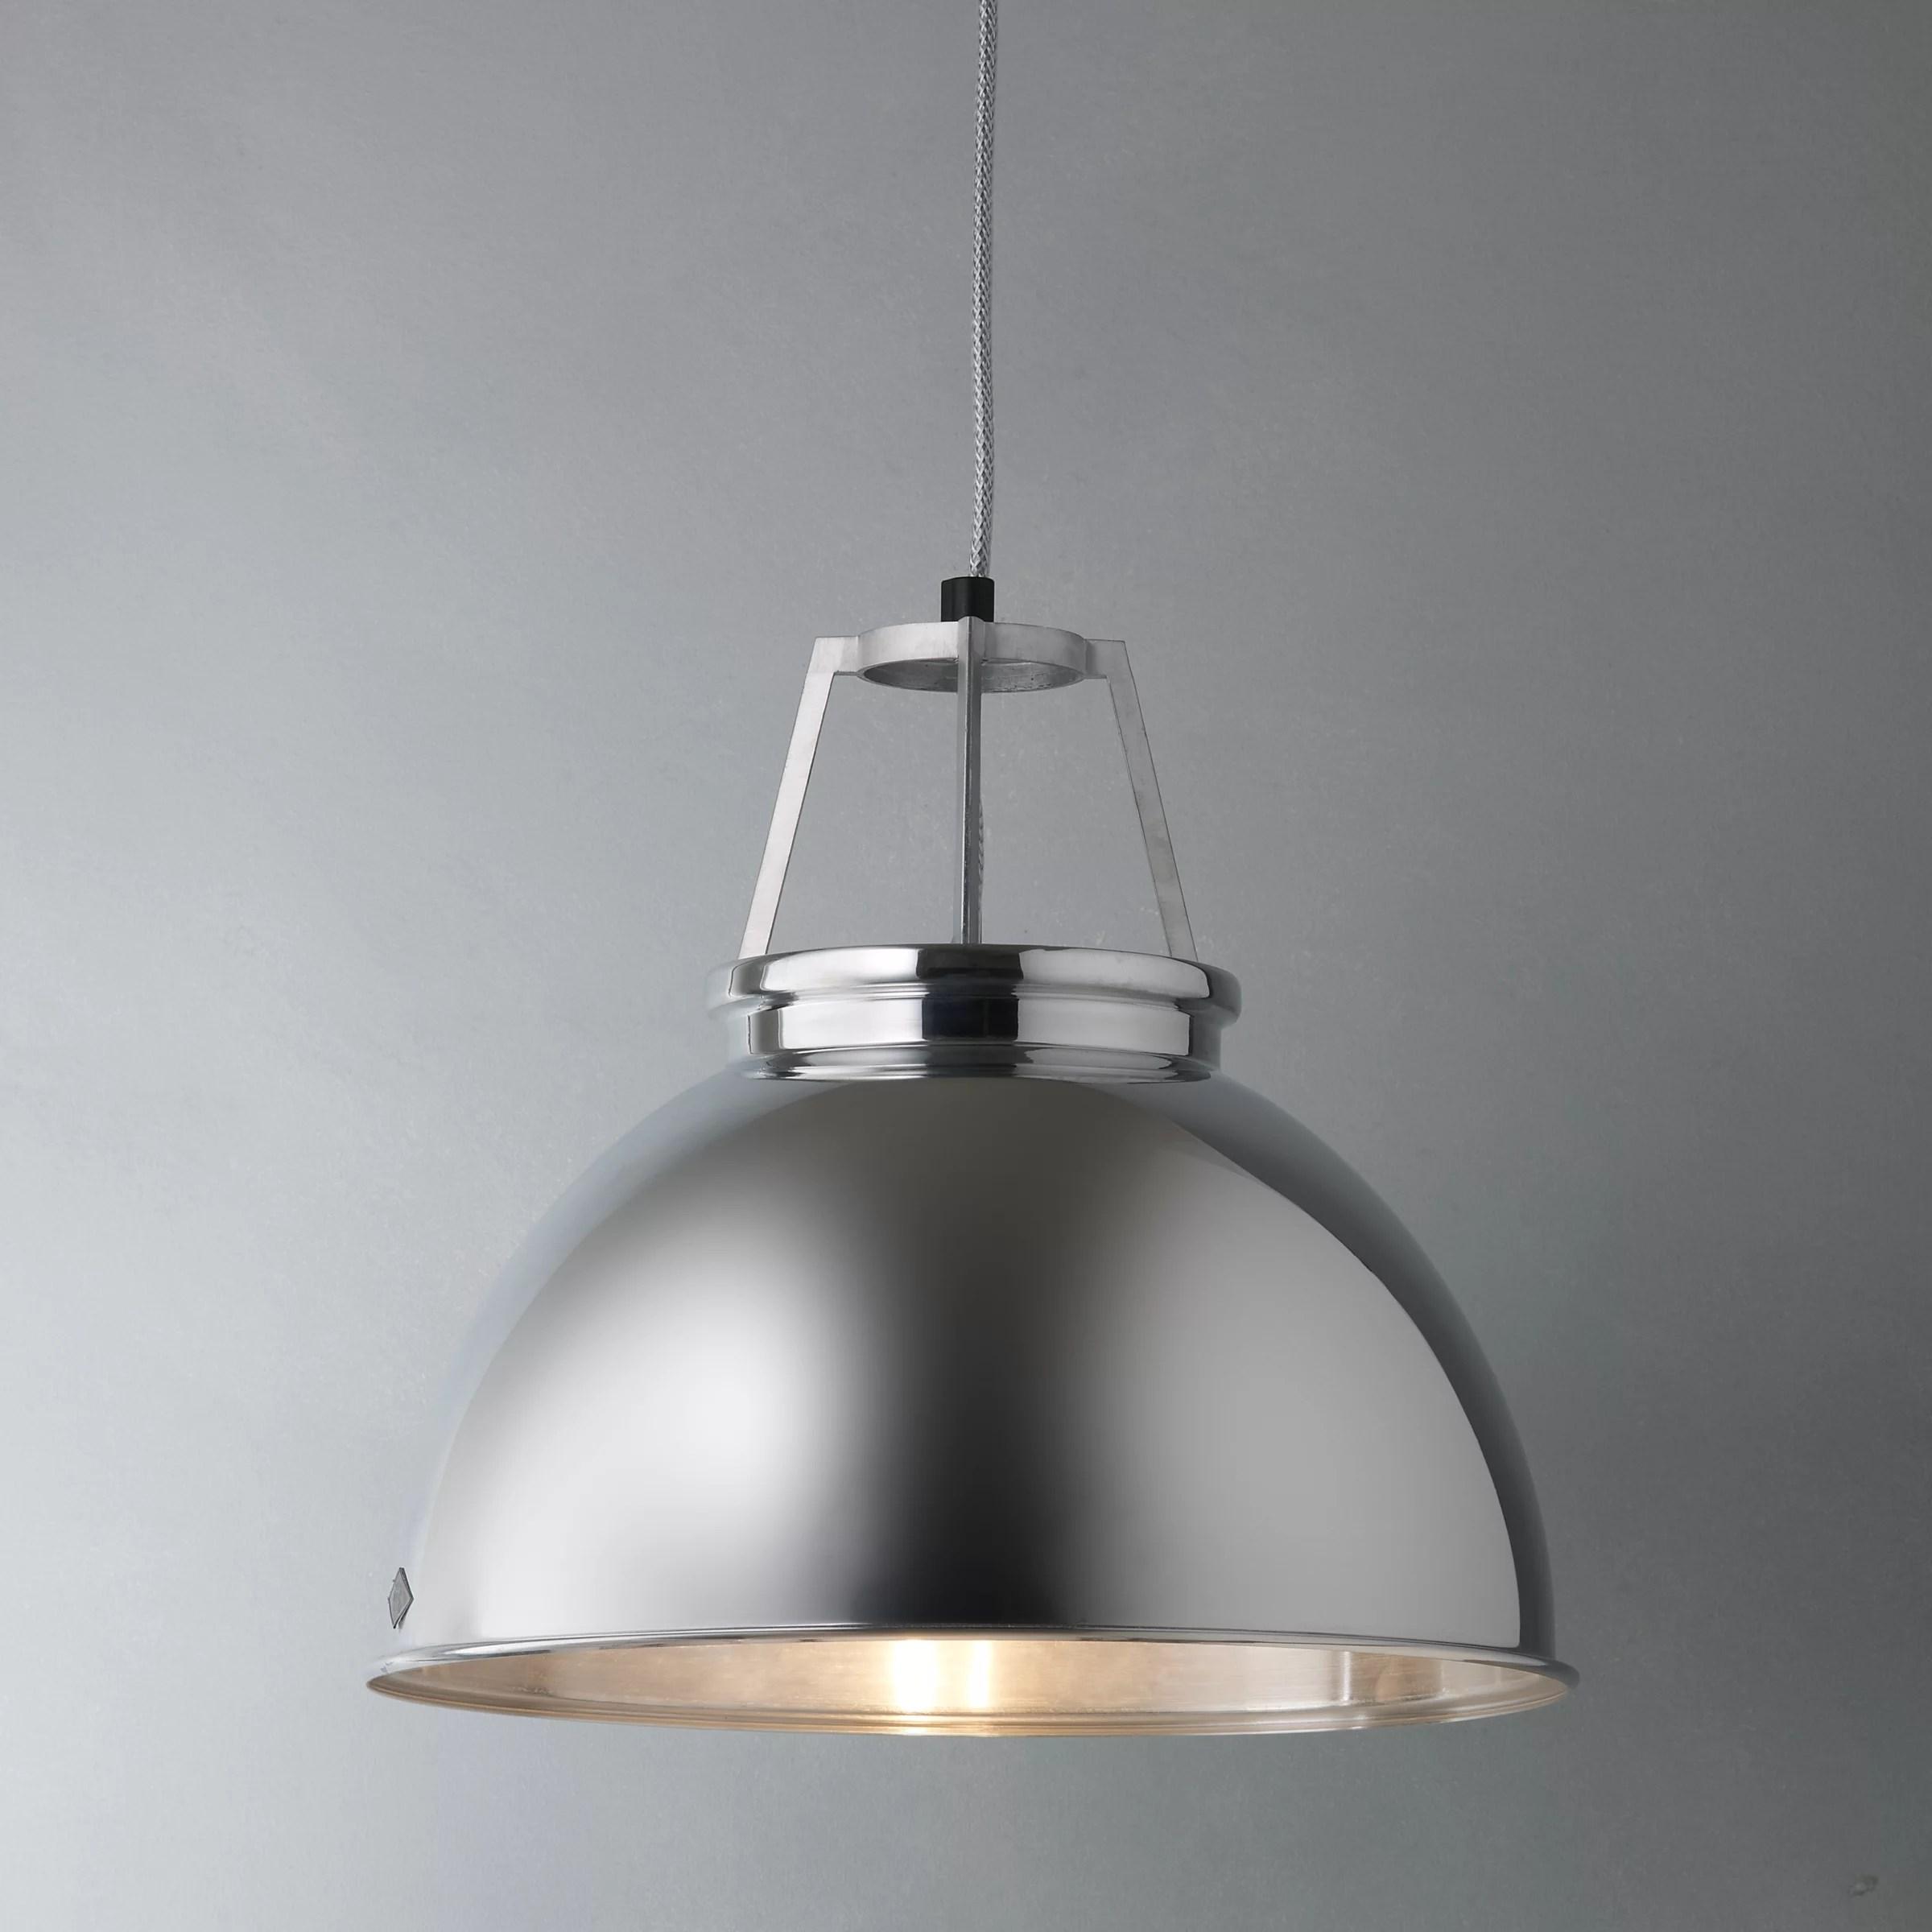 kitchen ceiling fixtures free standing islands with seating lights john lewis partners original btc titan light size 3